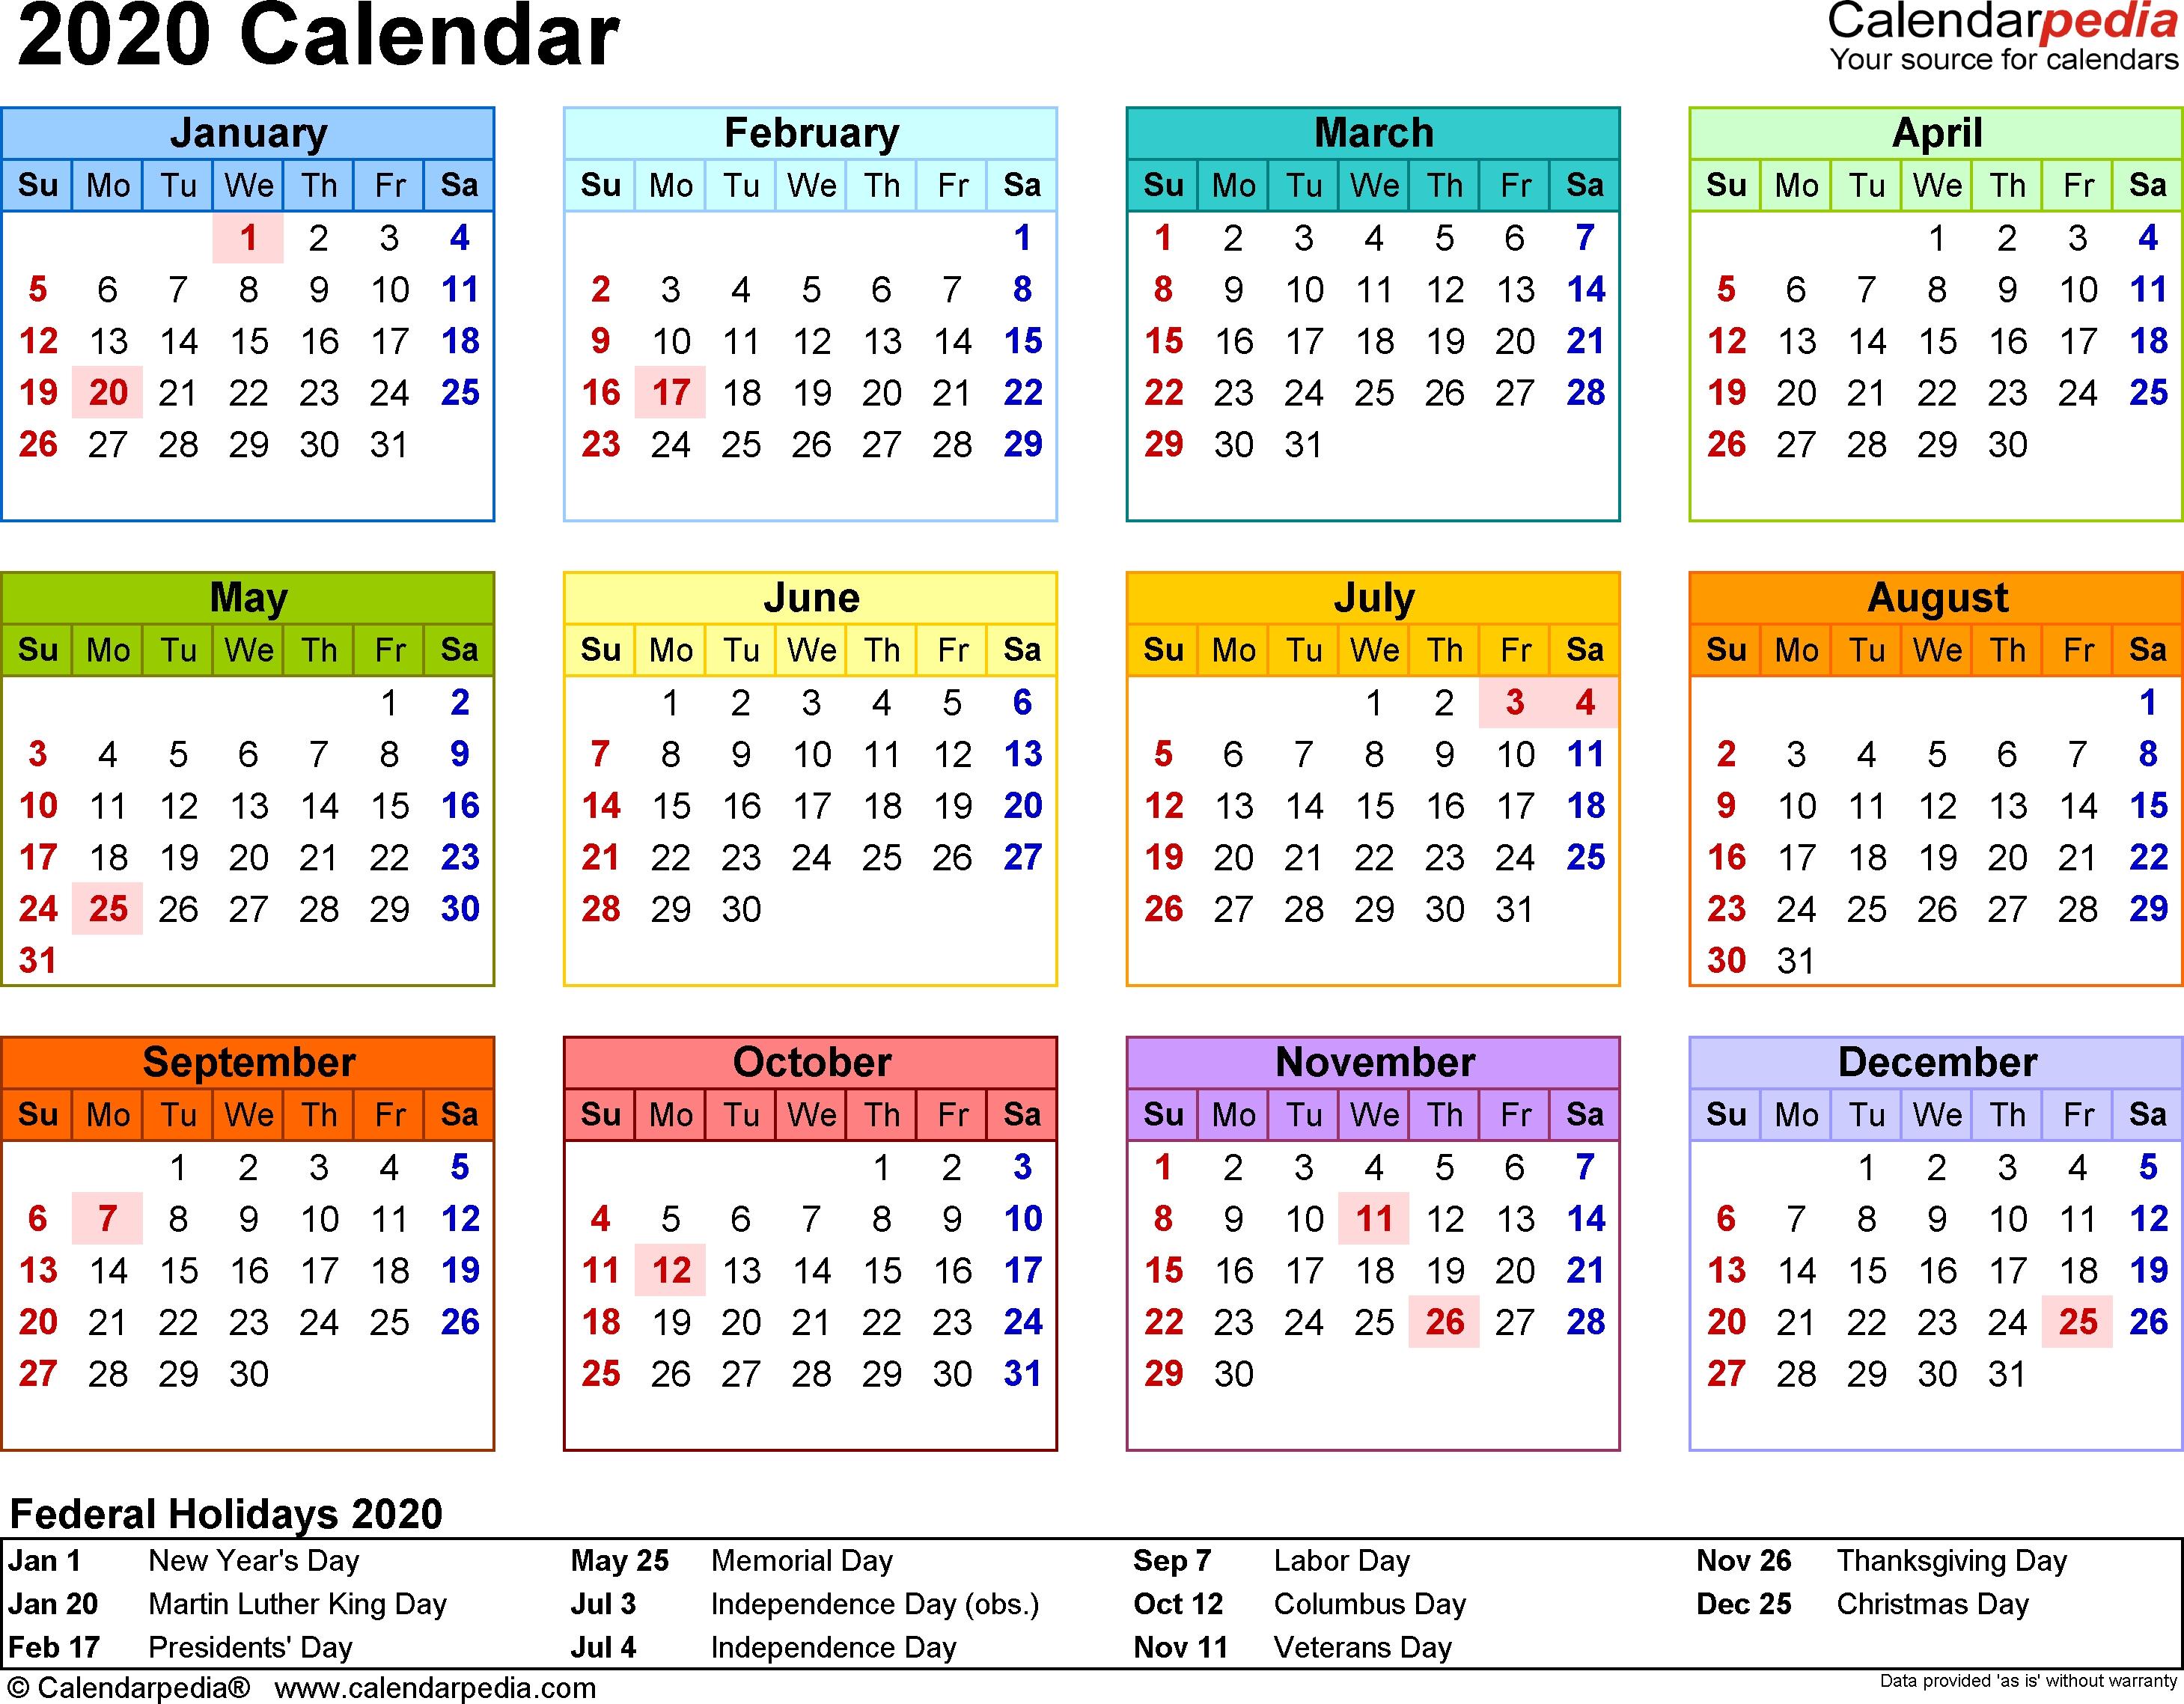 2020 Calendar - Download 17 Free Printable Excel Templates (.xlsx) 2020 Calendar With Holidays Usa